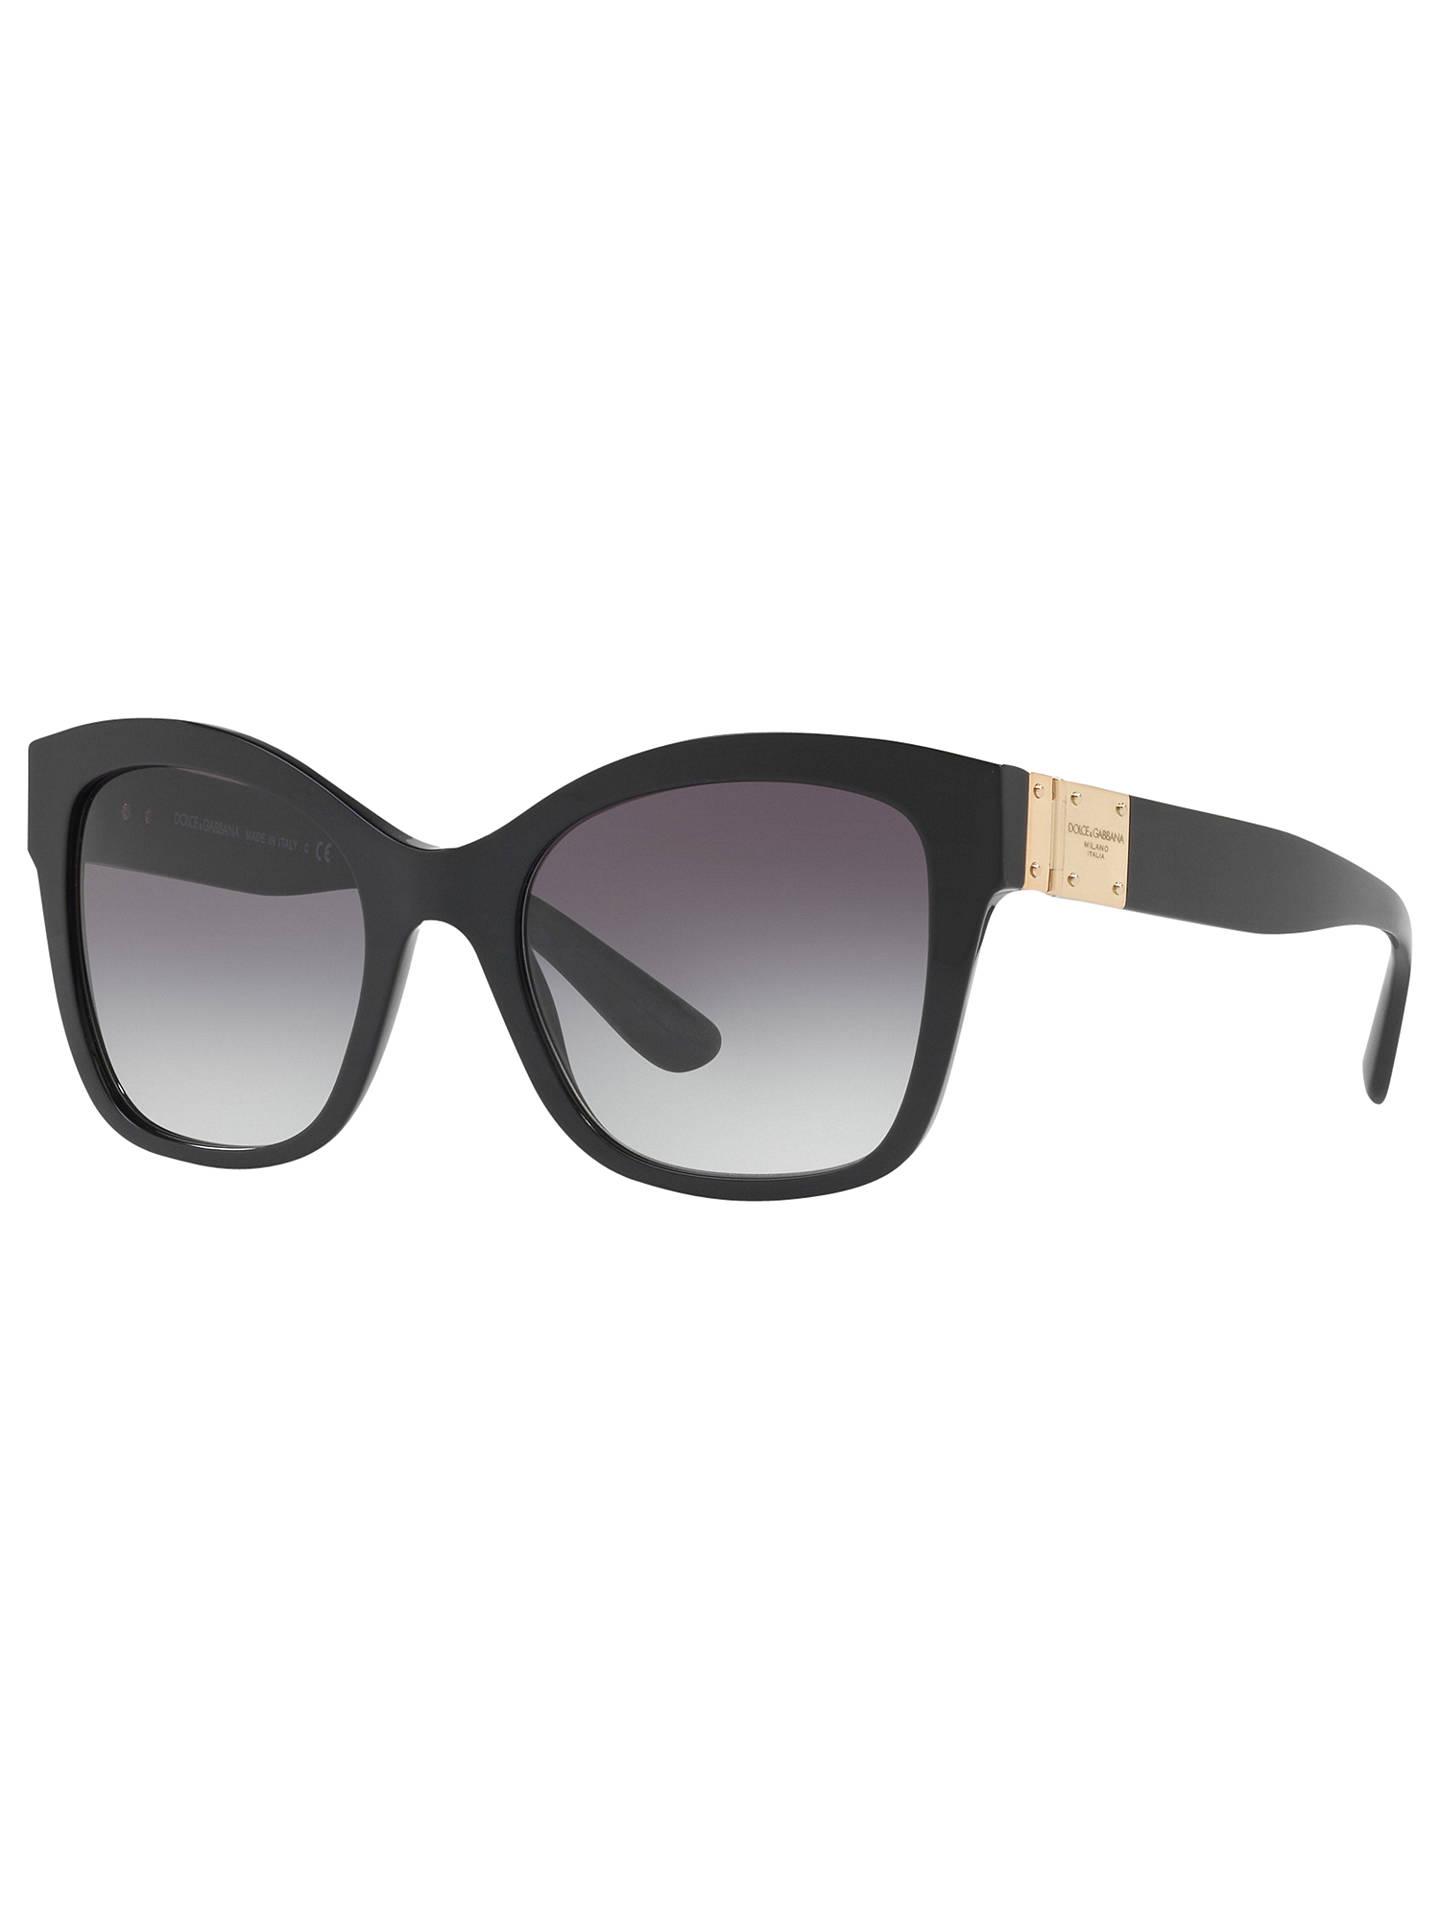 560fdb08db52 Buy Dolce   Gabbana DG4309 Square Sunglasses